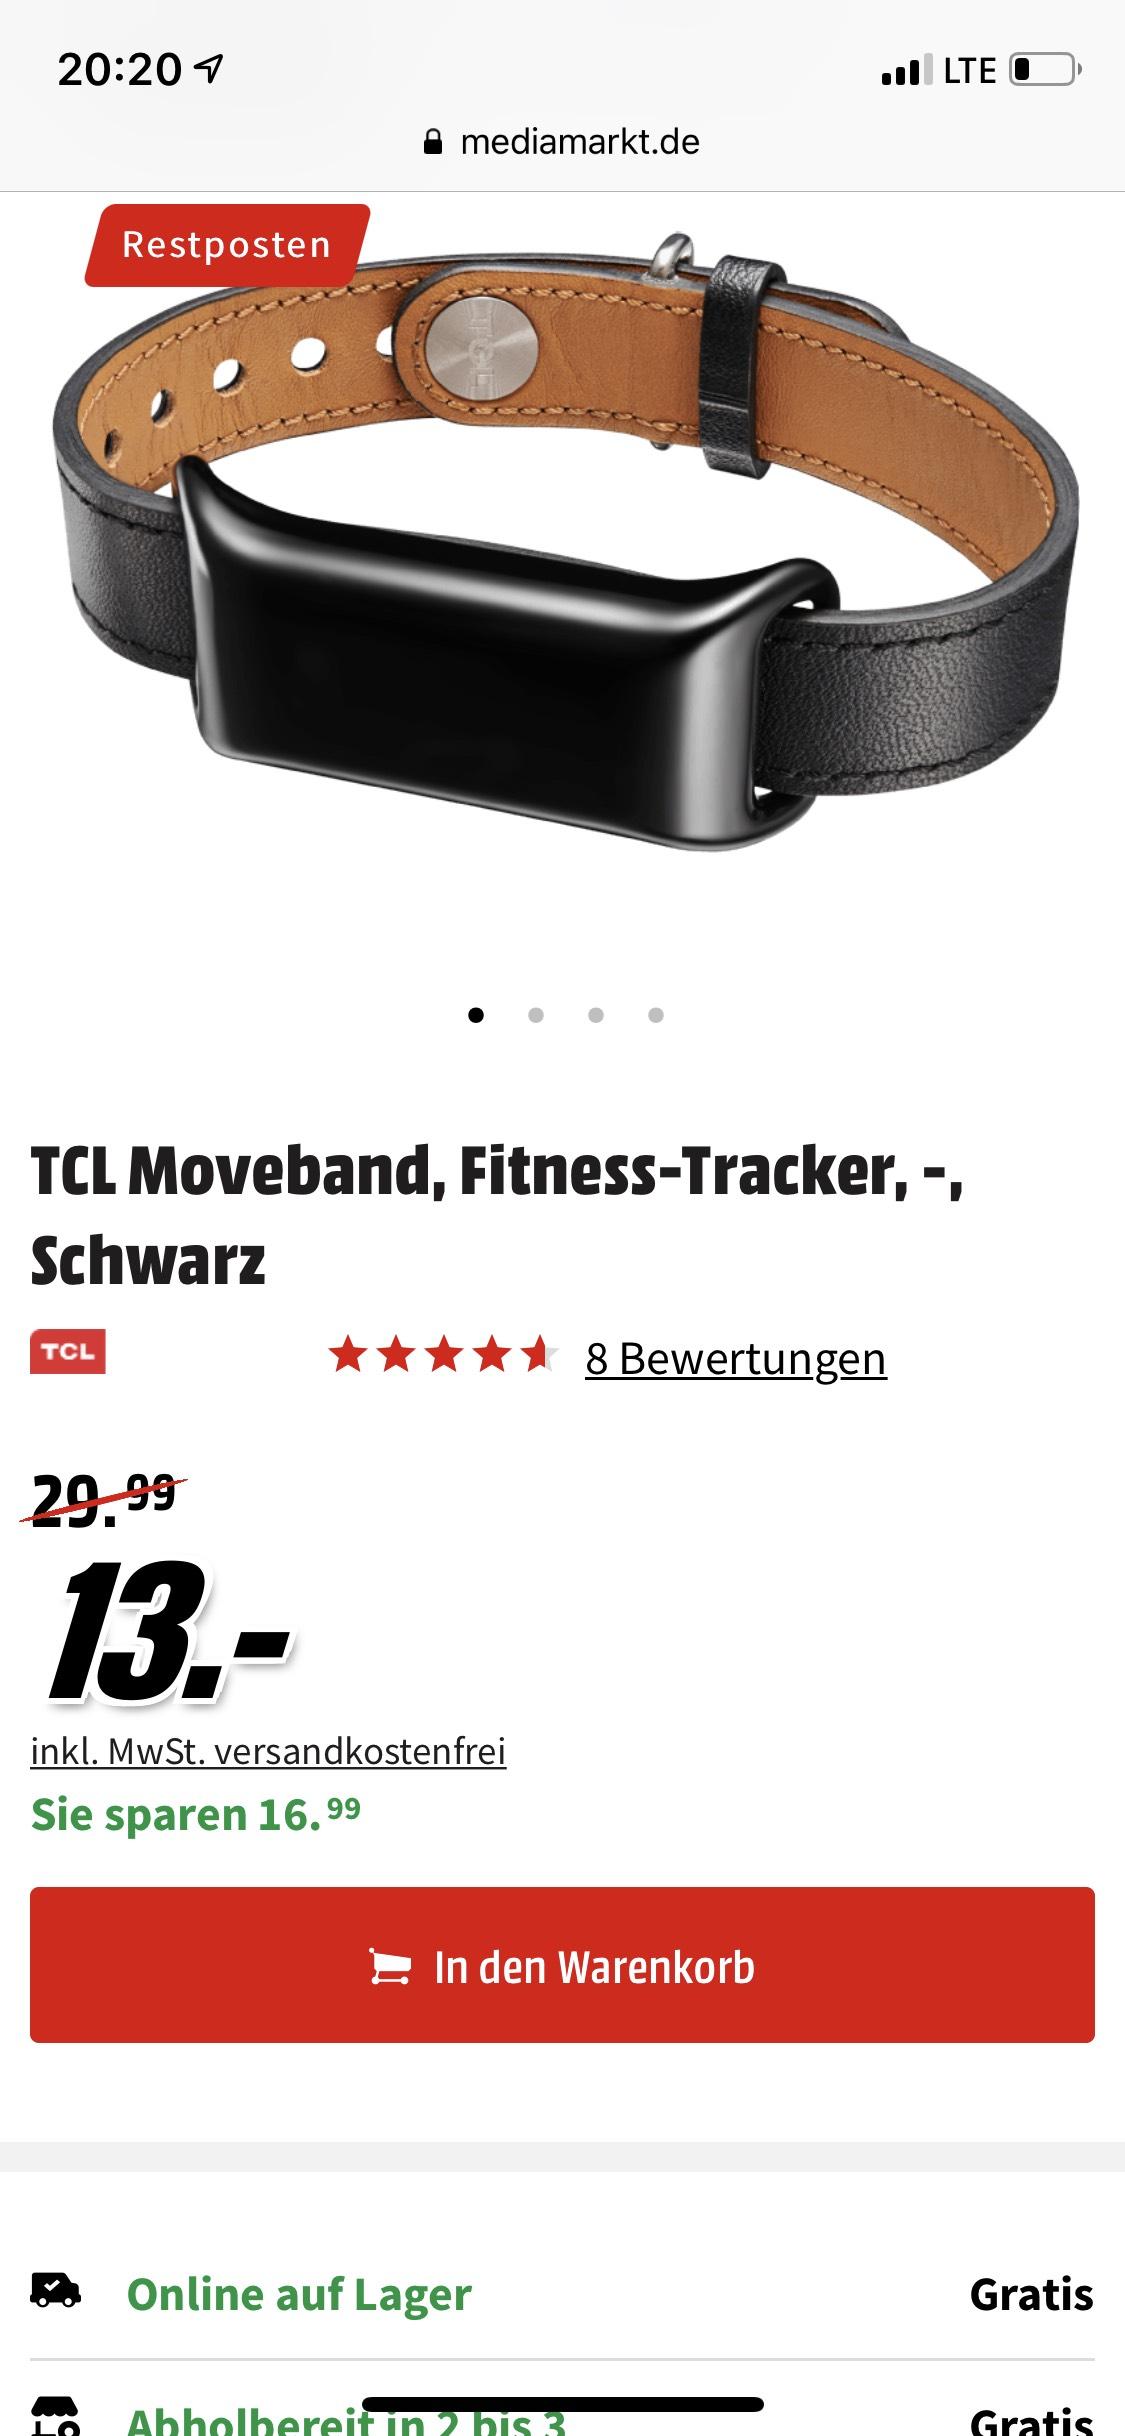 TCL Moveband, Fitness-Tracker, -, Schwarz